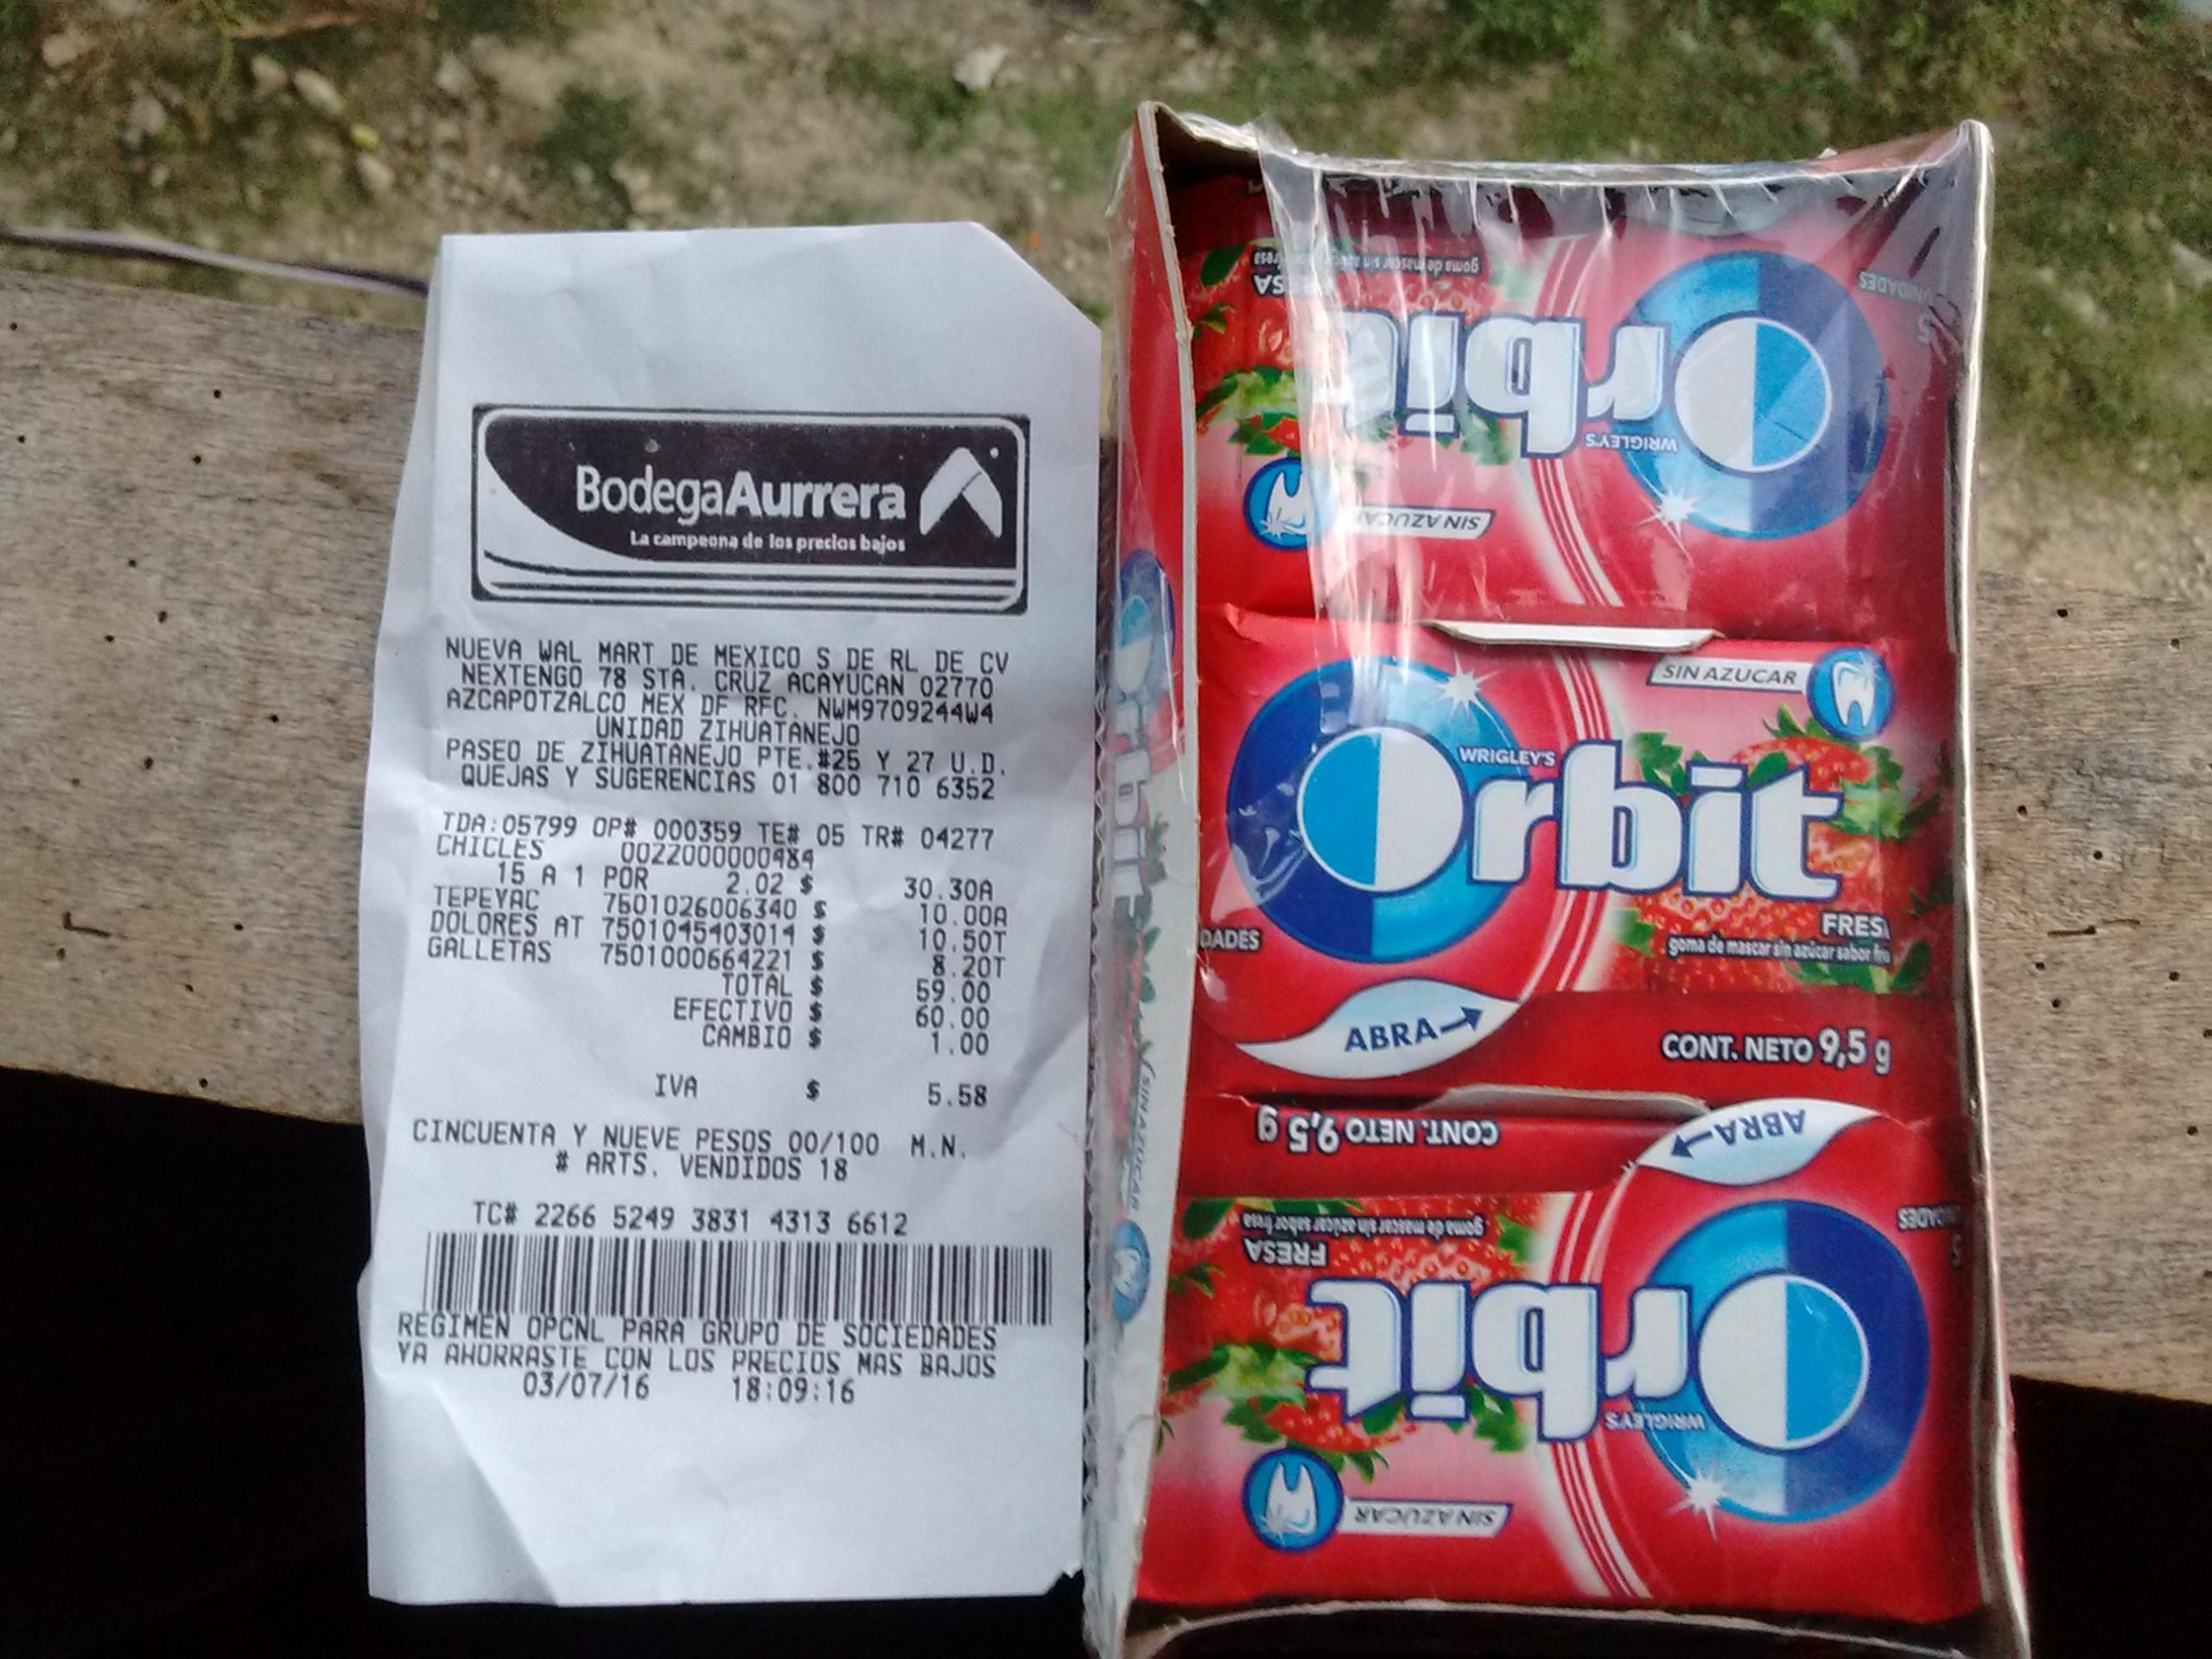 Bodega Aurrerá Zihuatanejo: chicles Orbit fresa de 9.5g a $2.02